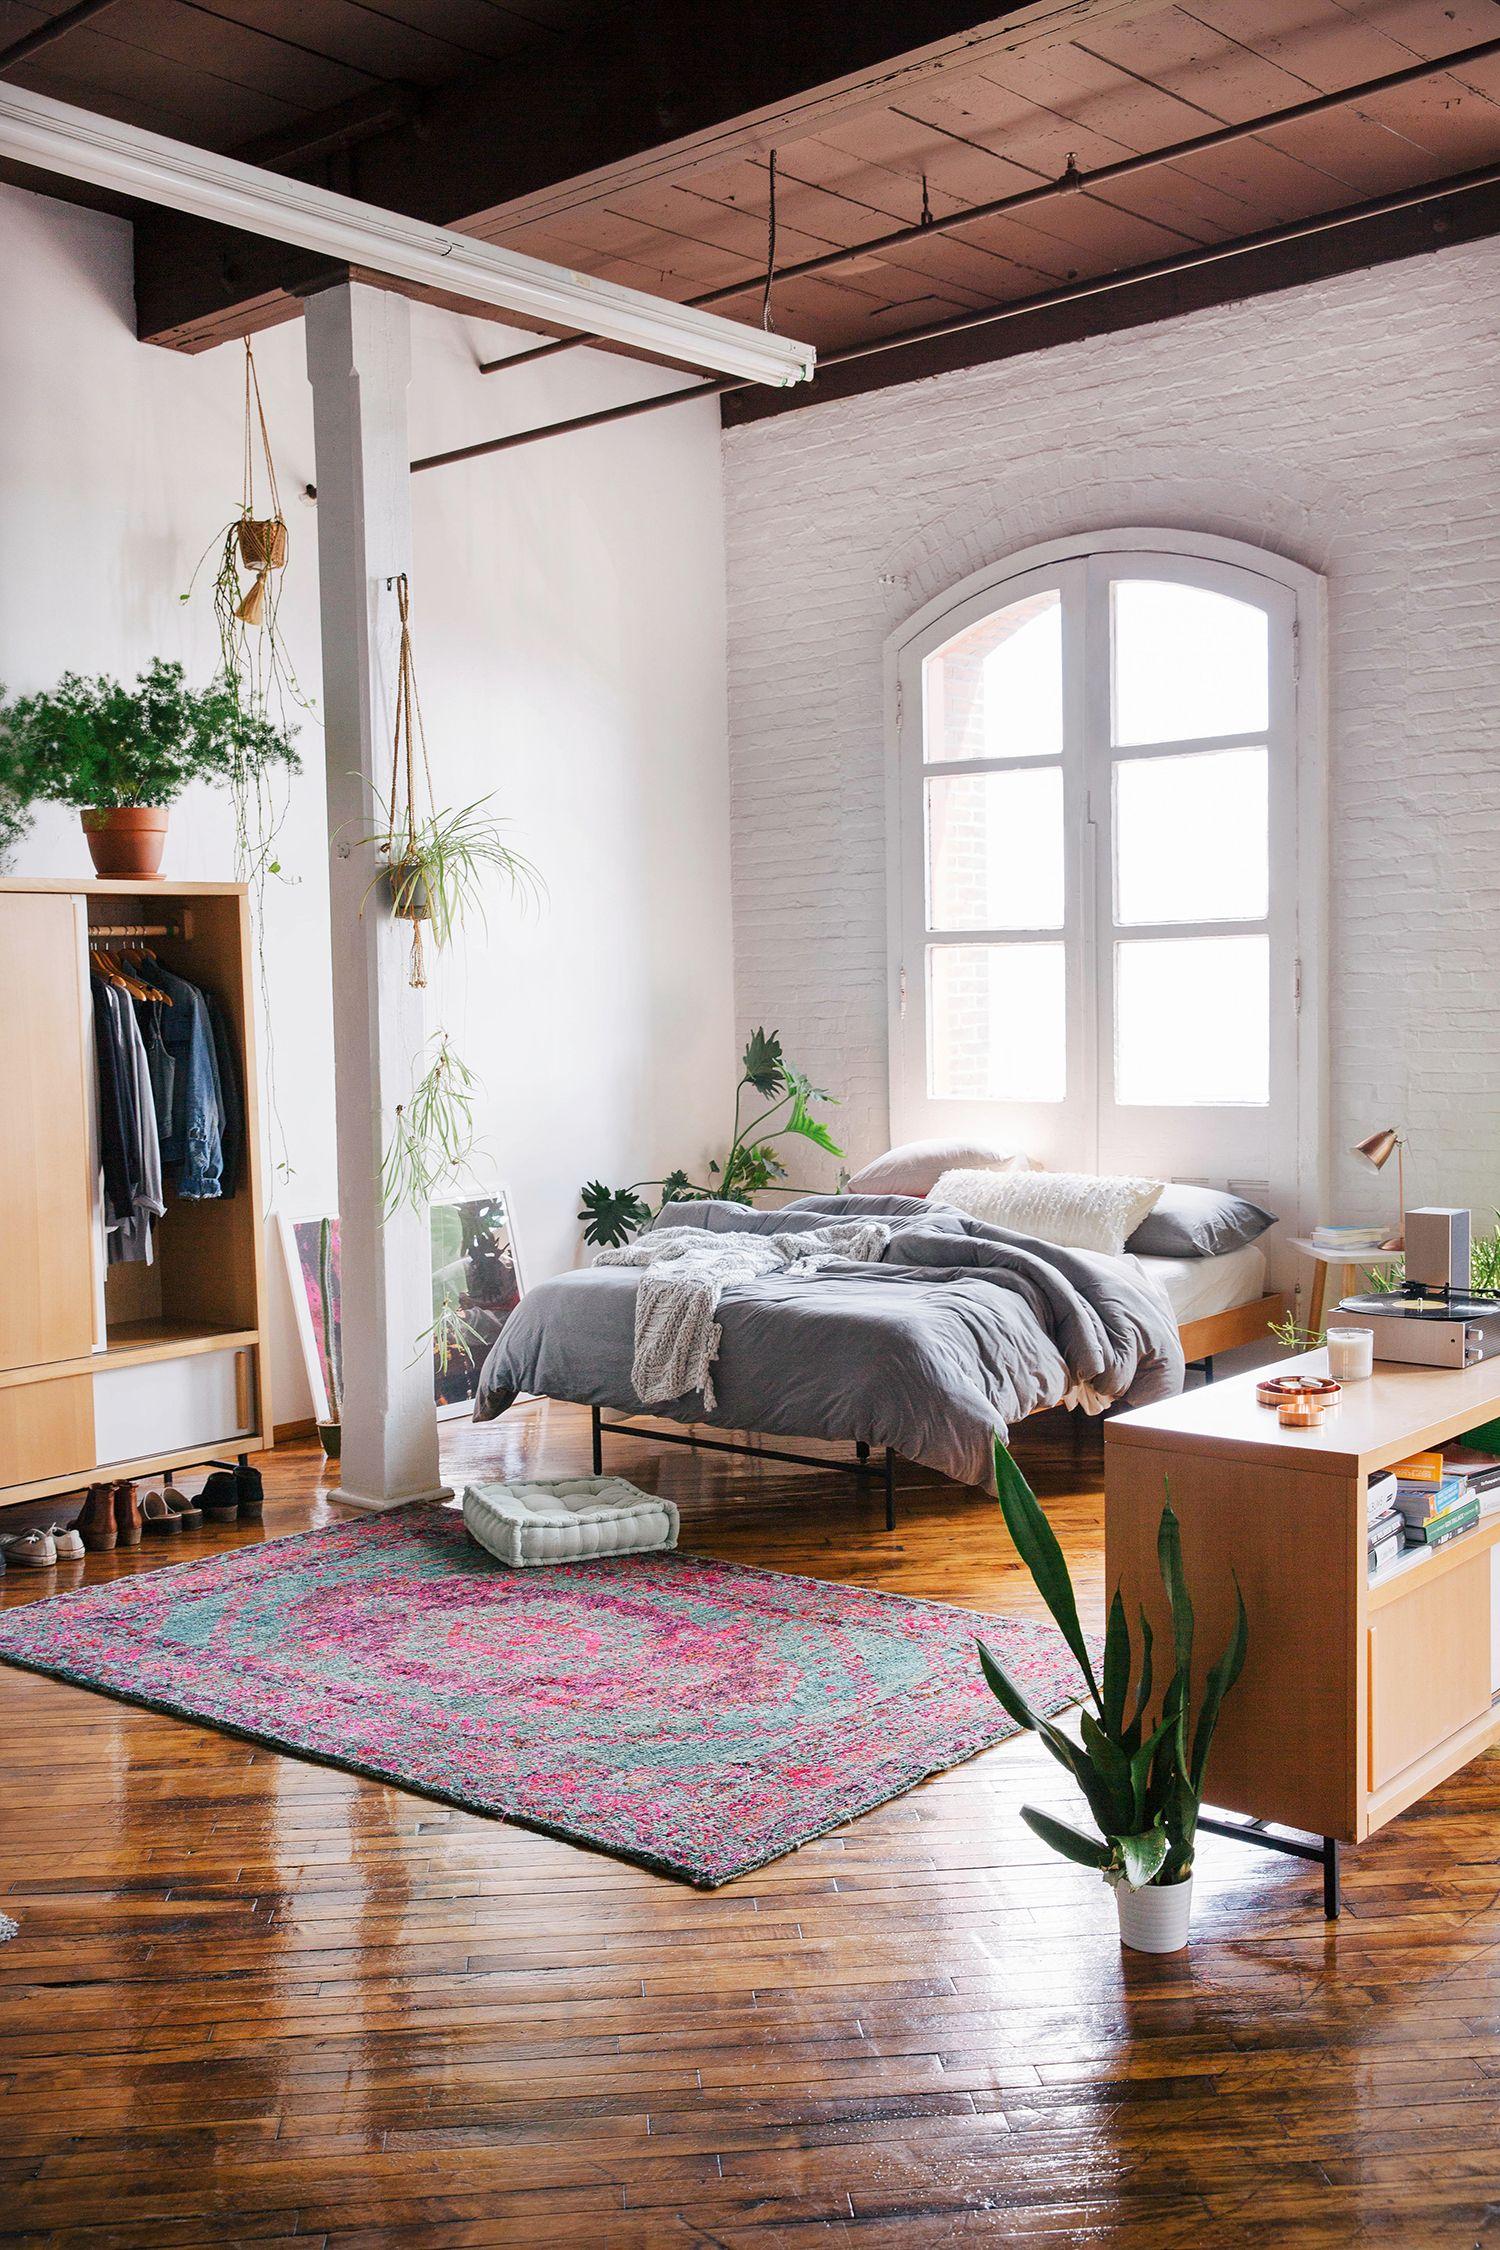 Urban loft bedroom  loft bedroom  casas  Pinterest  Urban outfitters Urban and Bedrooms